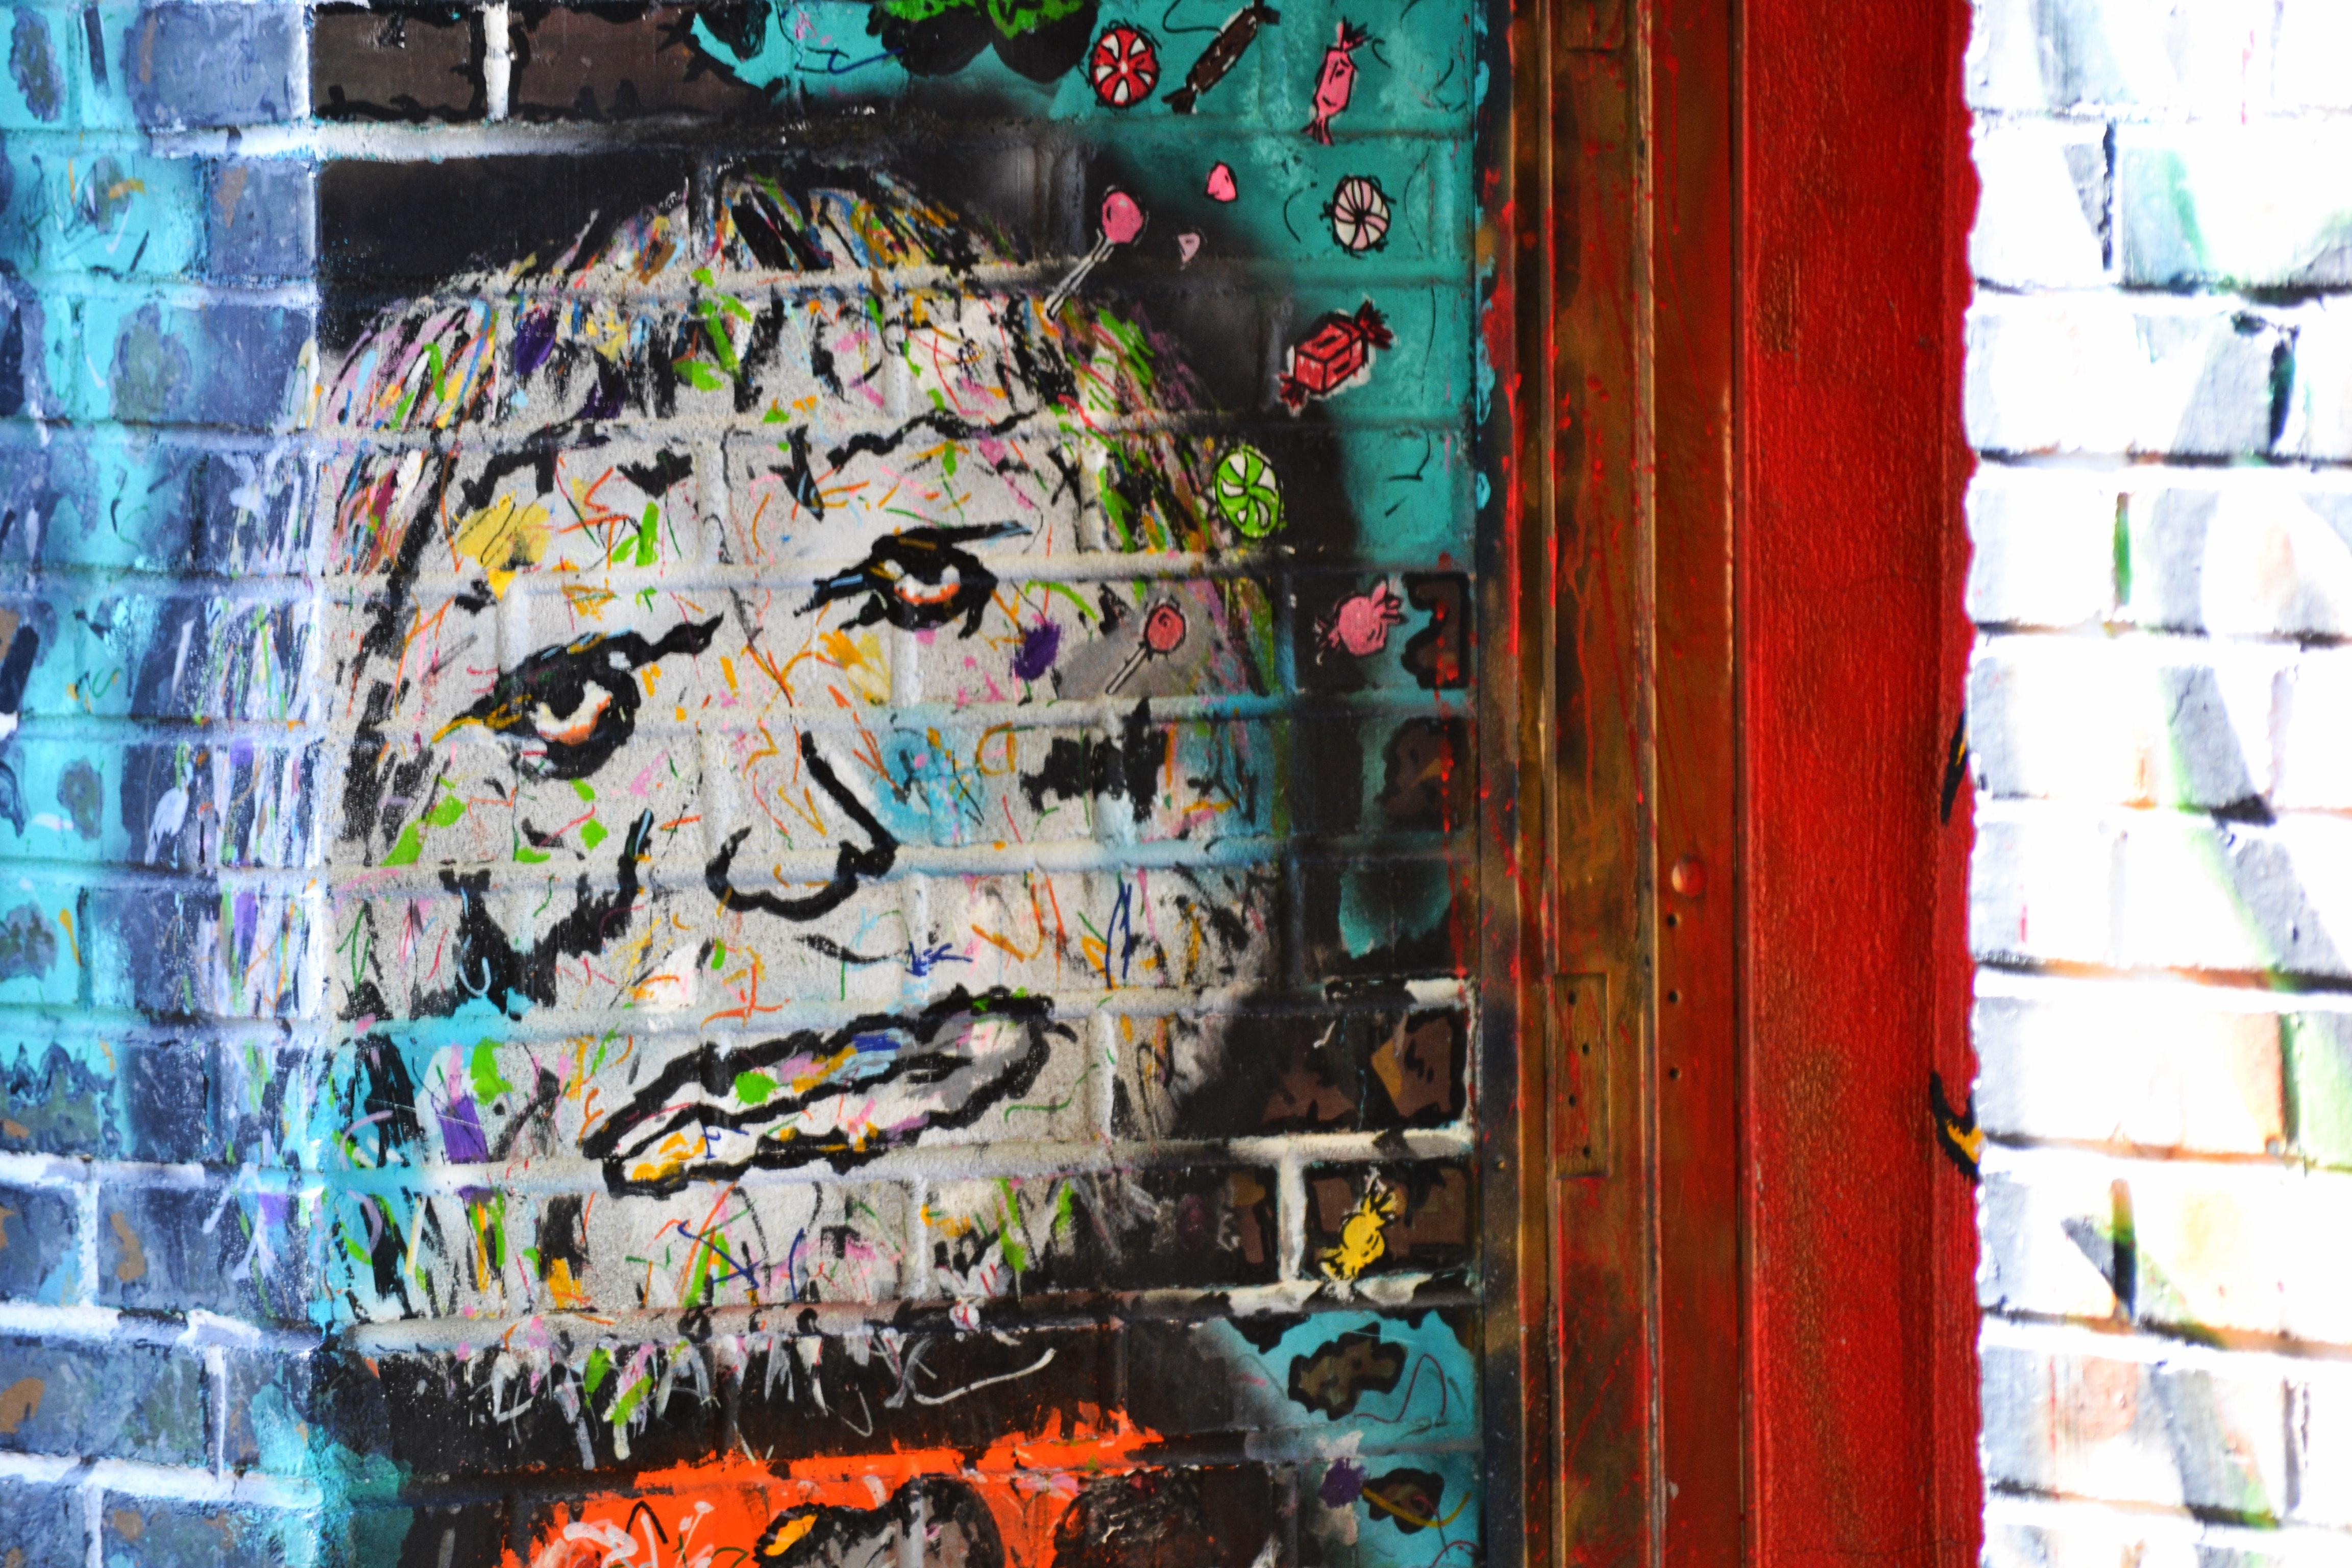 Street art of an evil face on a brick wall photo